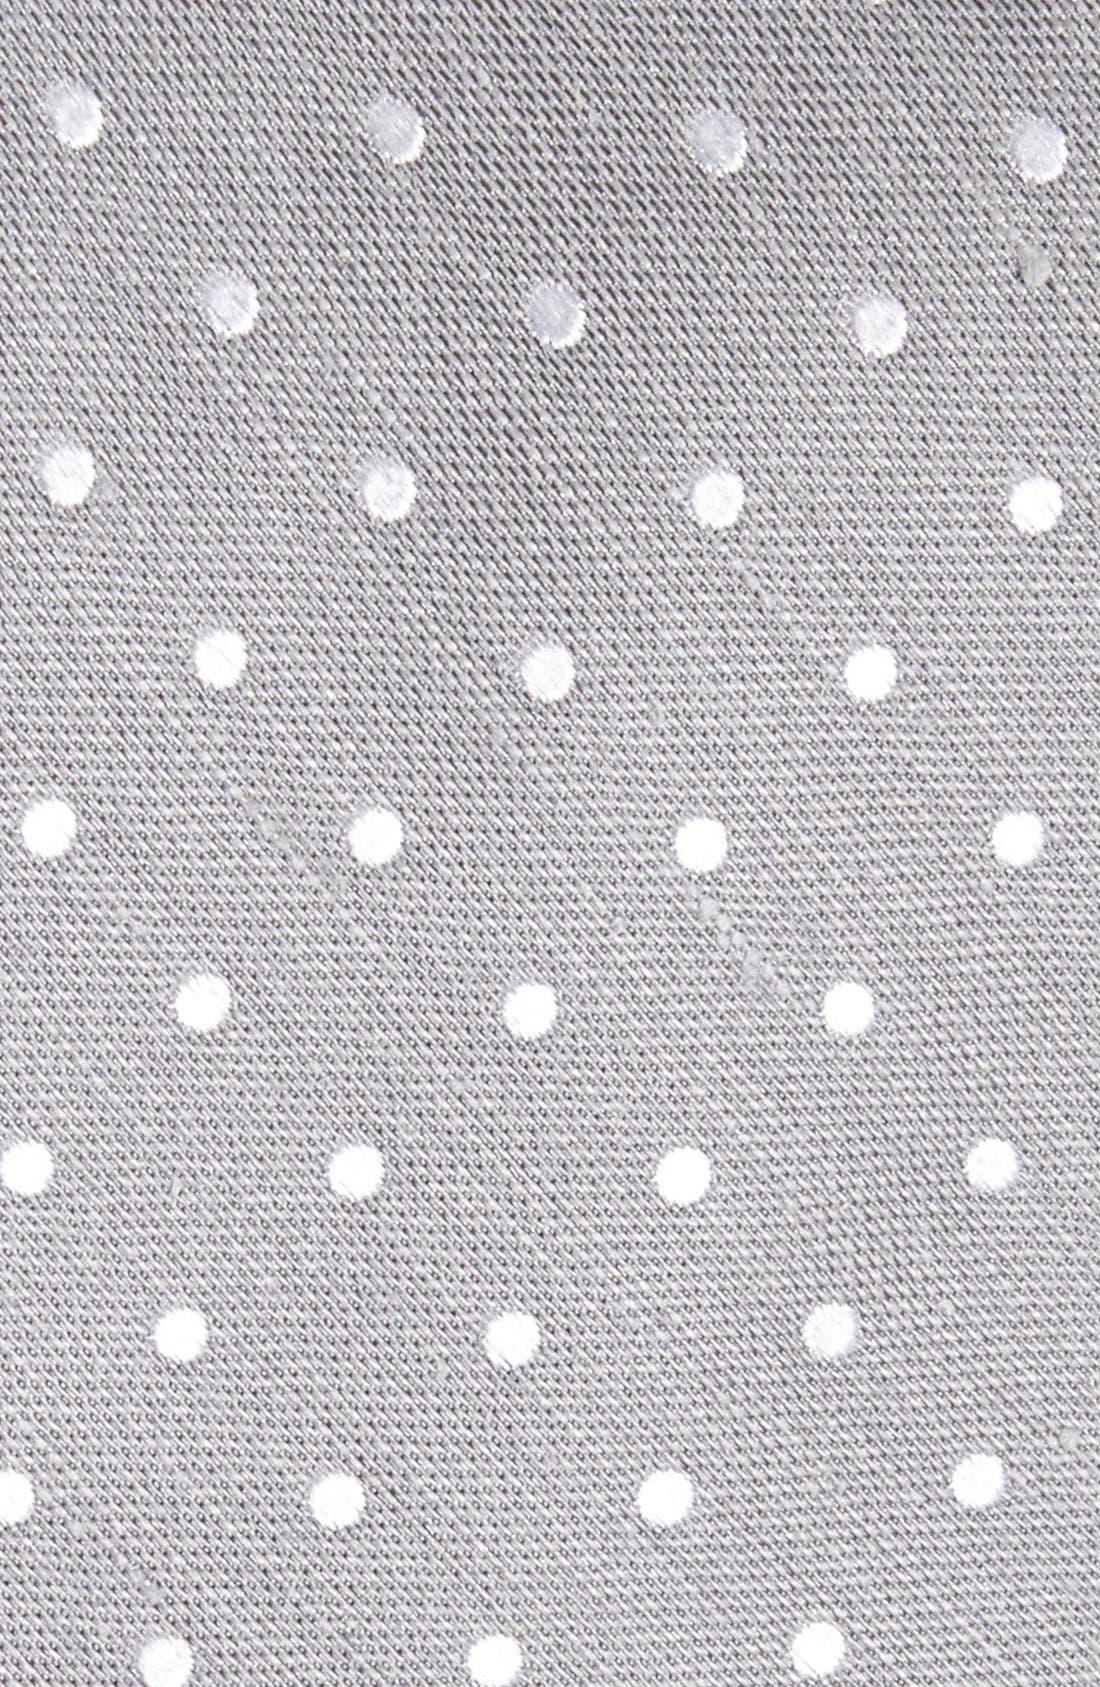 Dot Silk & Linen Tie,                             Alternate thumbnail 2, color,                             040